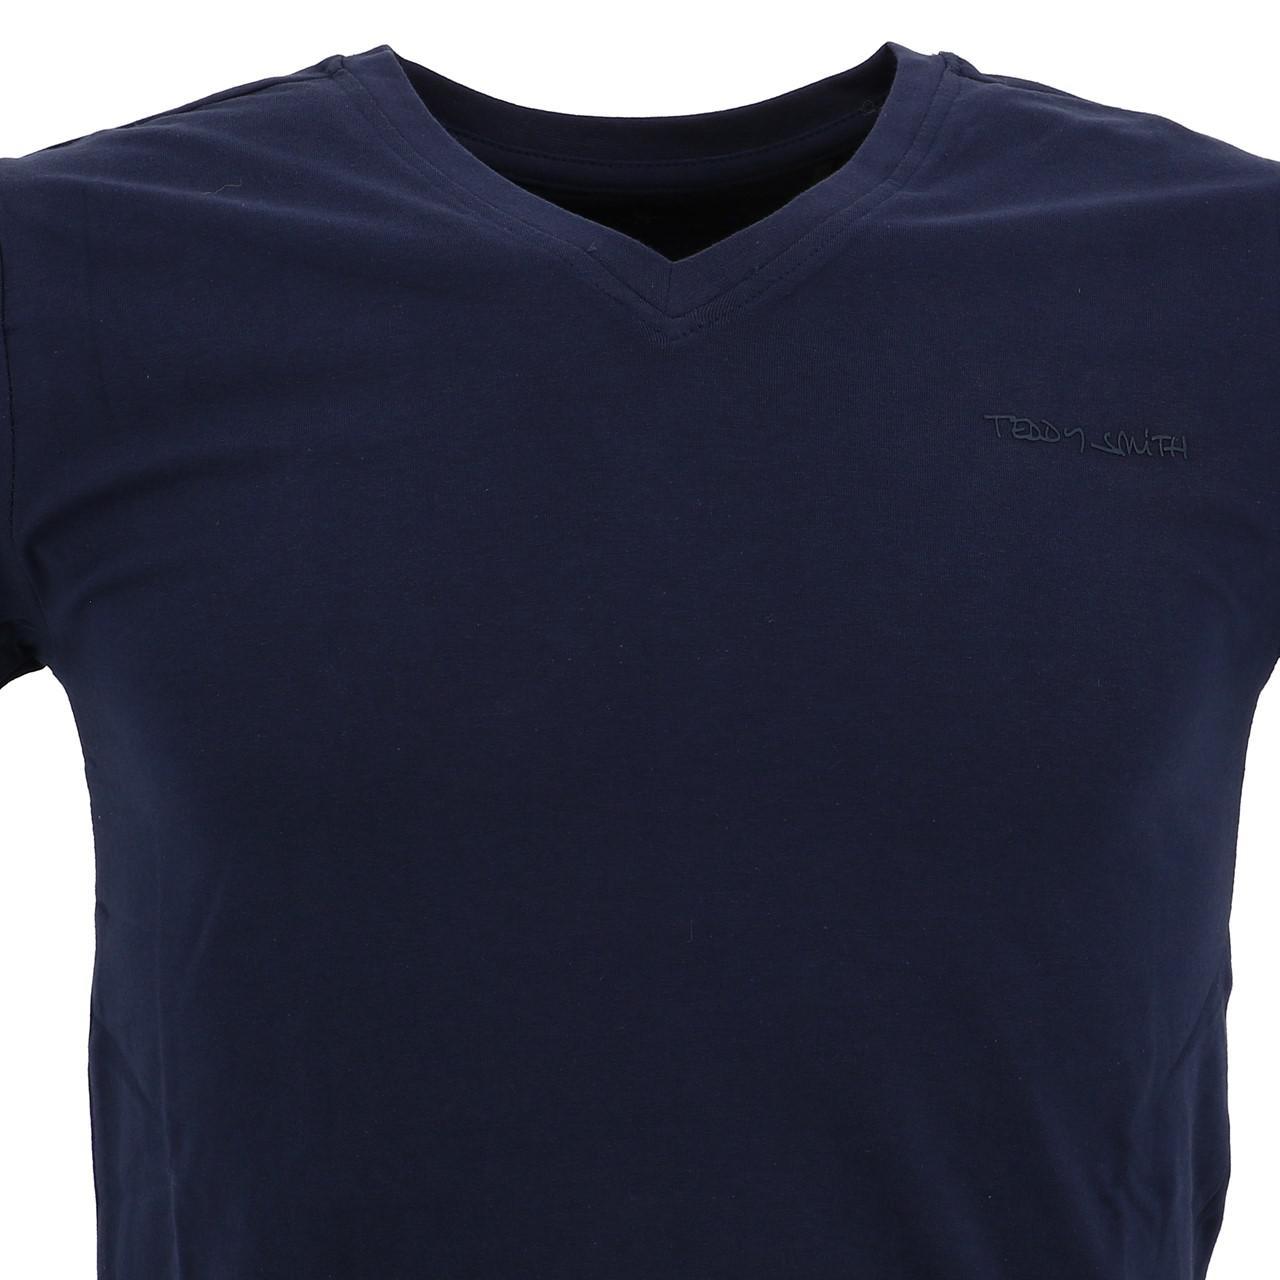 Short-Sleeve-T-Shirt-Teddy-Smith-Tawax-US-Navy-Mc-Tee-Blue-18153-New thumbnail 2